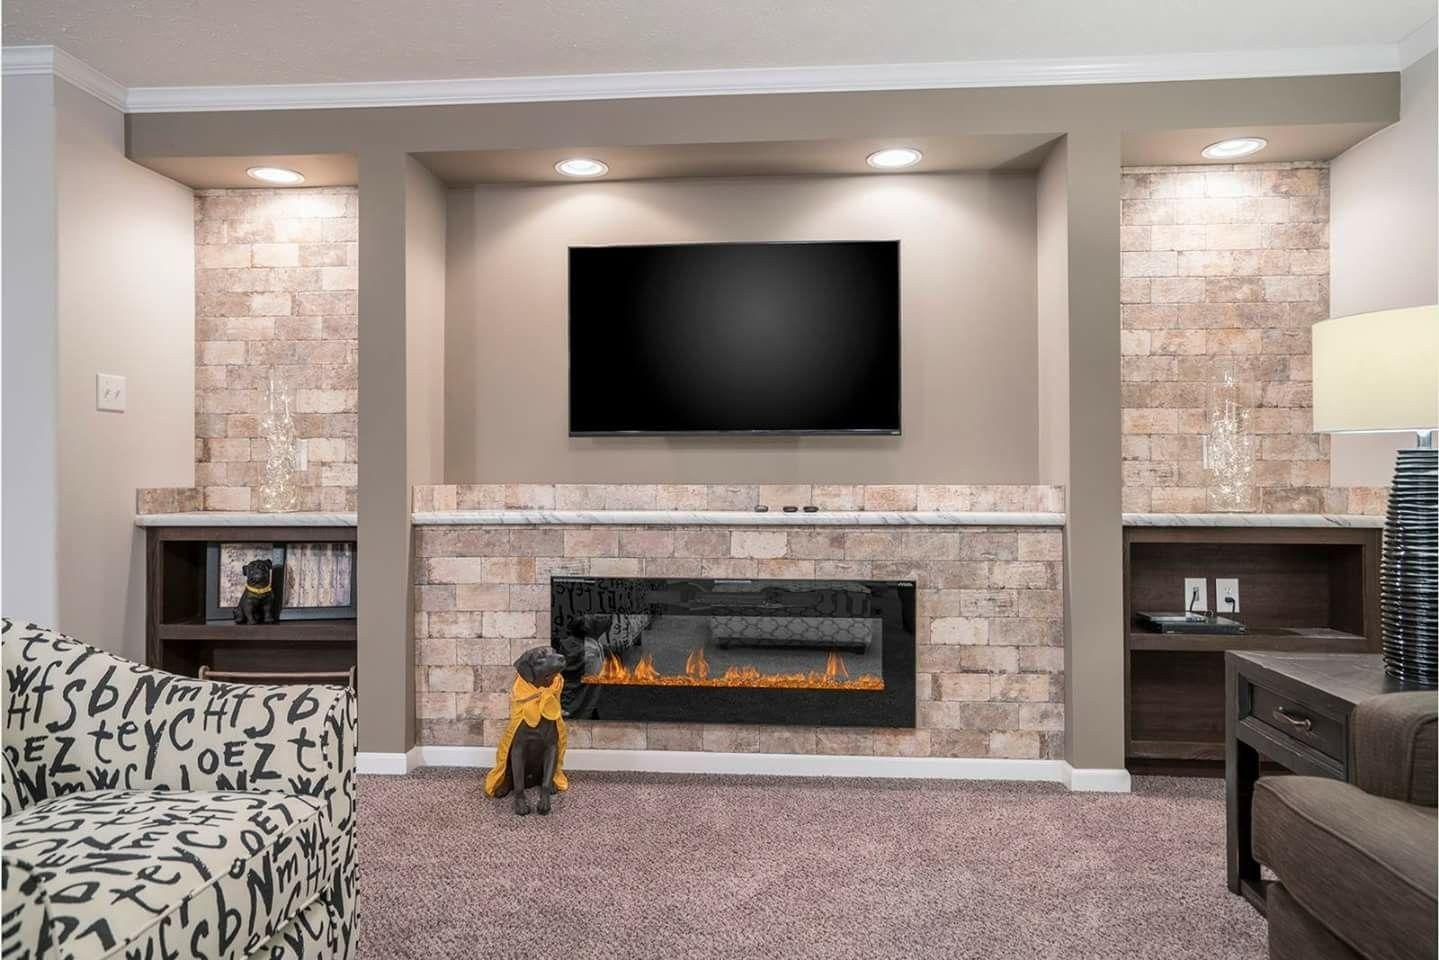 Great Fireplace Idea Small Basement Remodel Living Room Remodel Finishing Basement